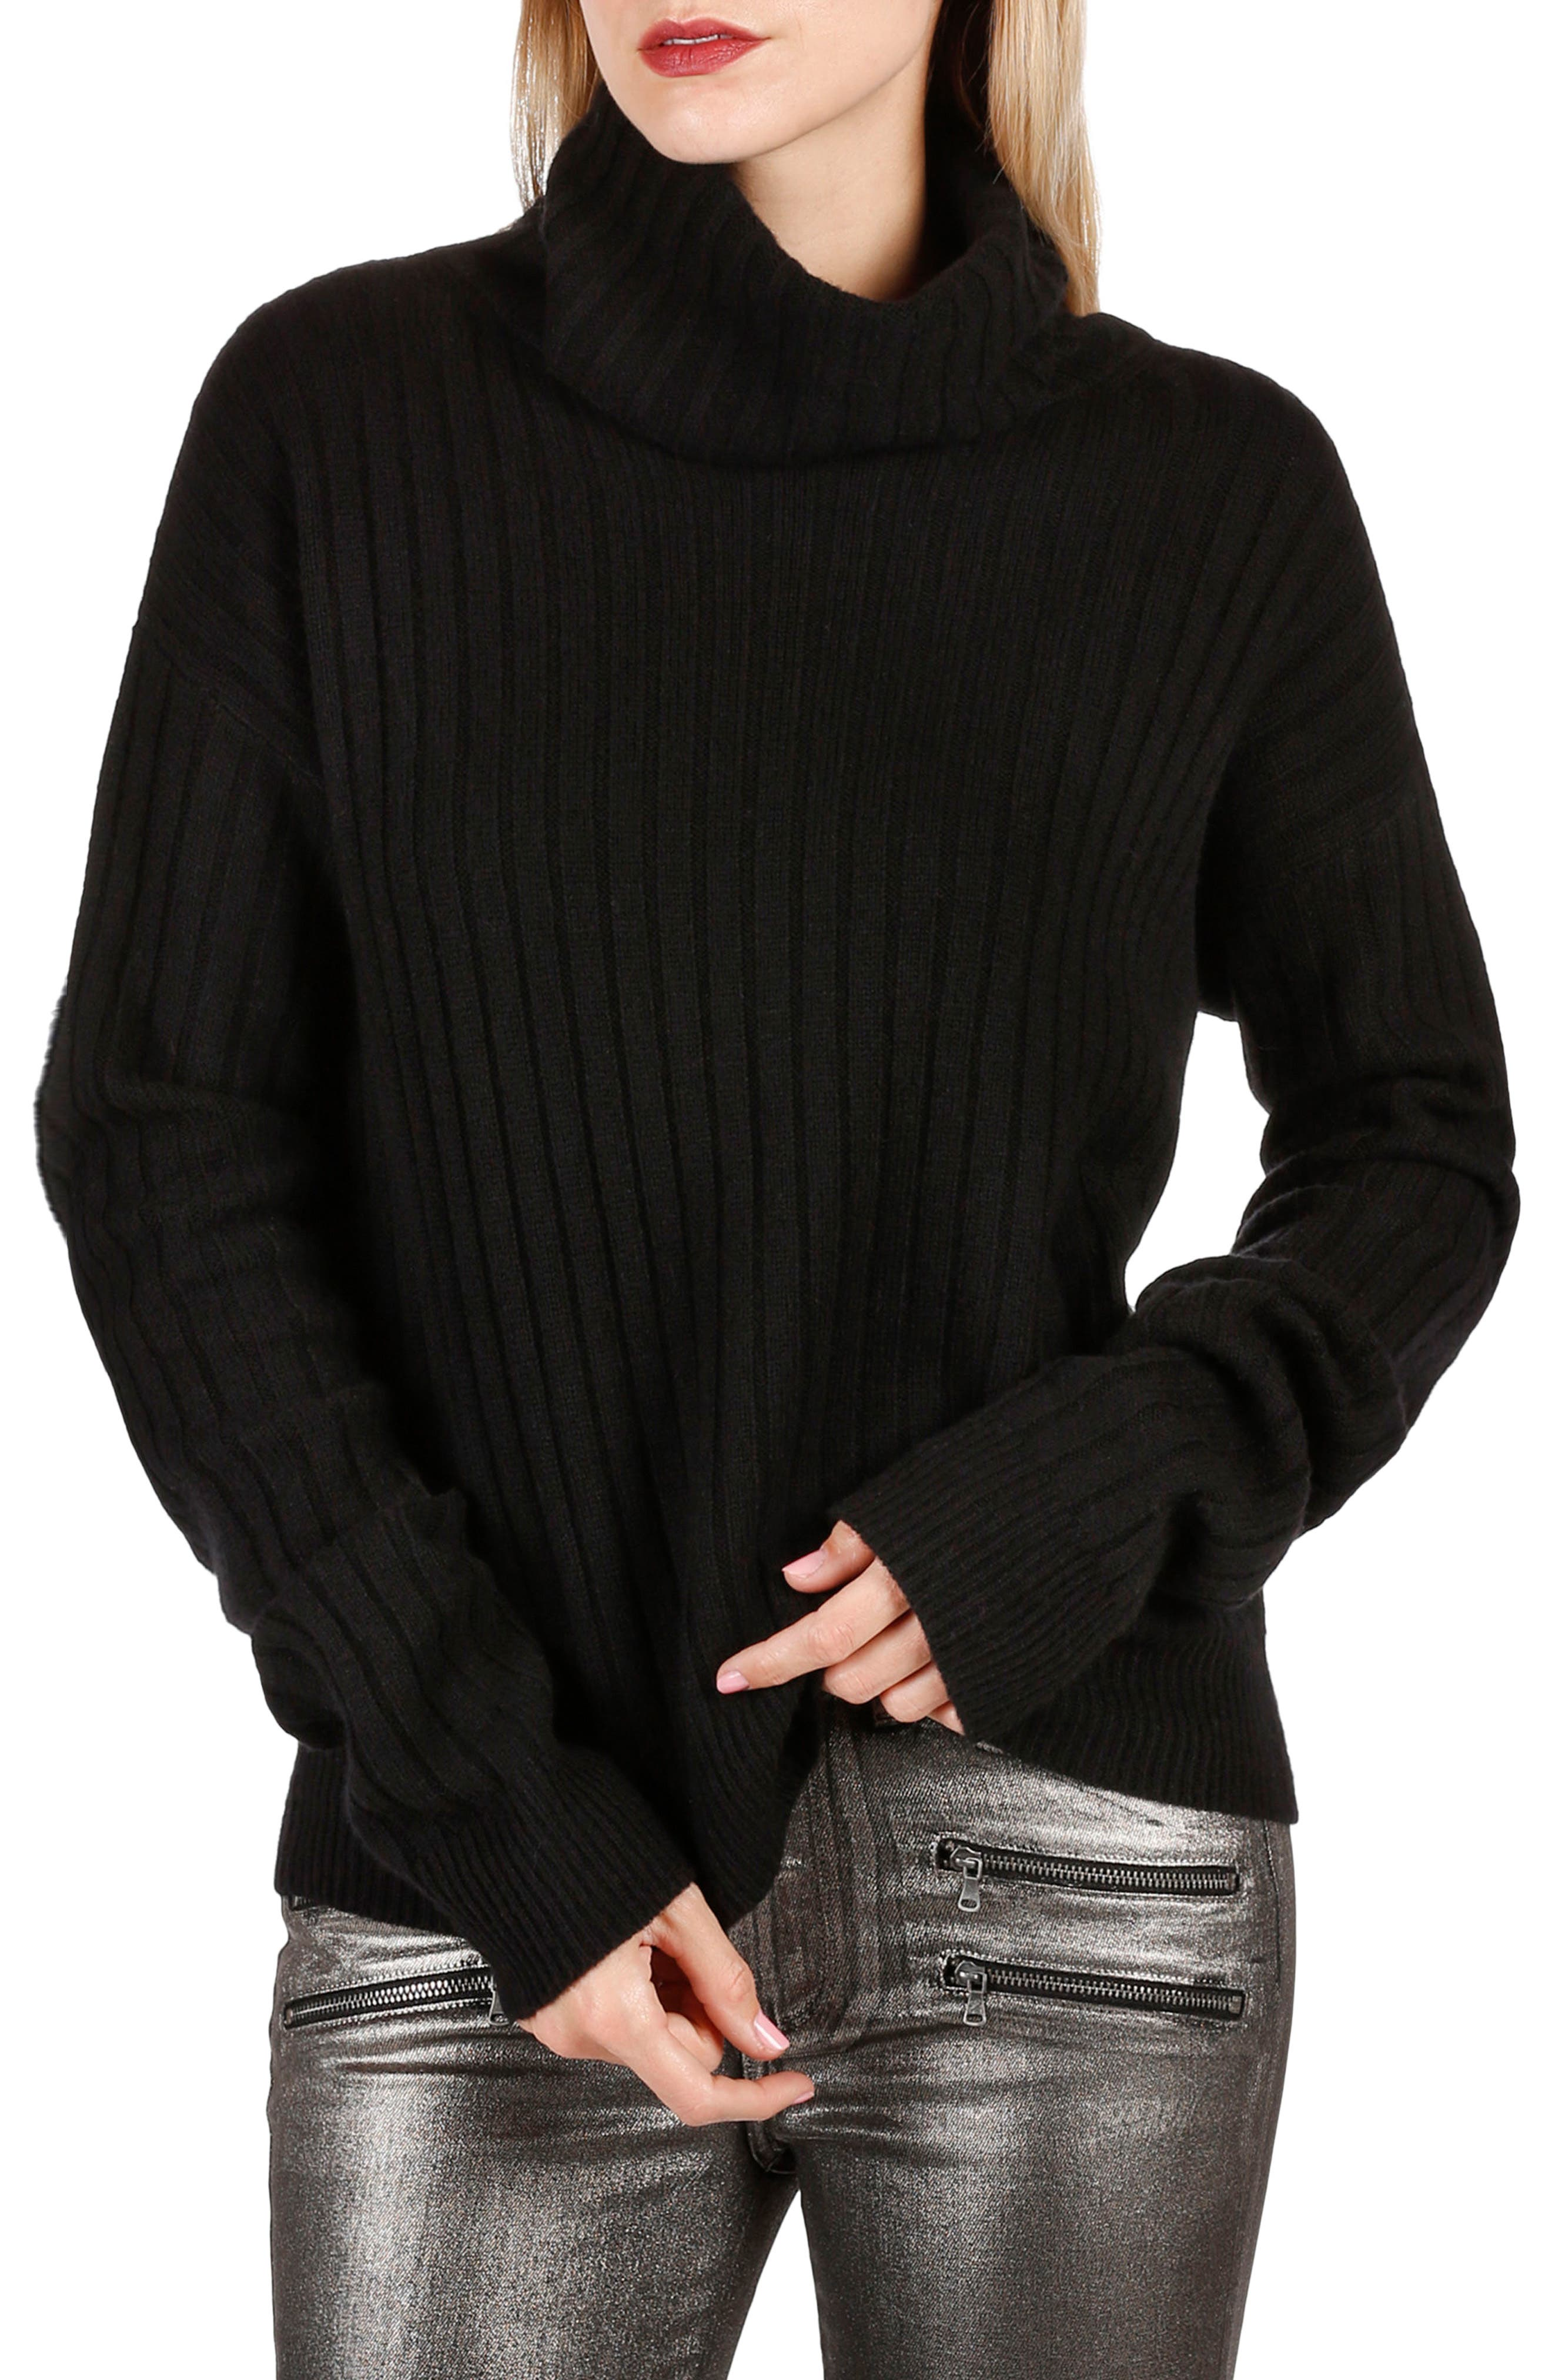 Rosie HW x PAIGE Mina Turtleneck Sweater,                         Main,                         color, 001